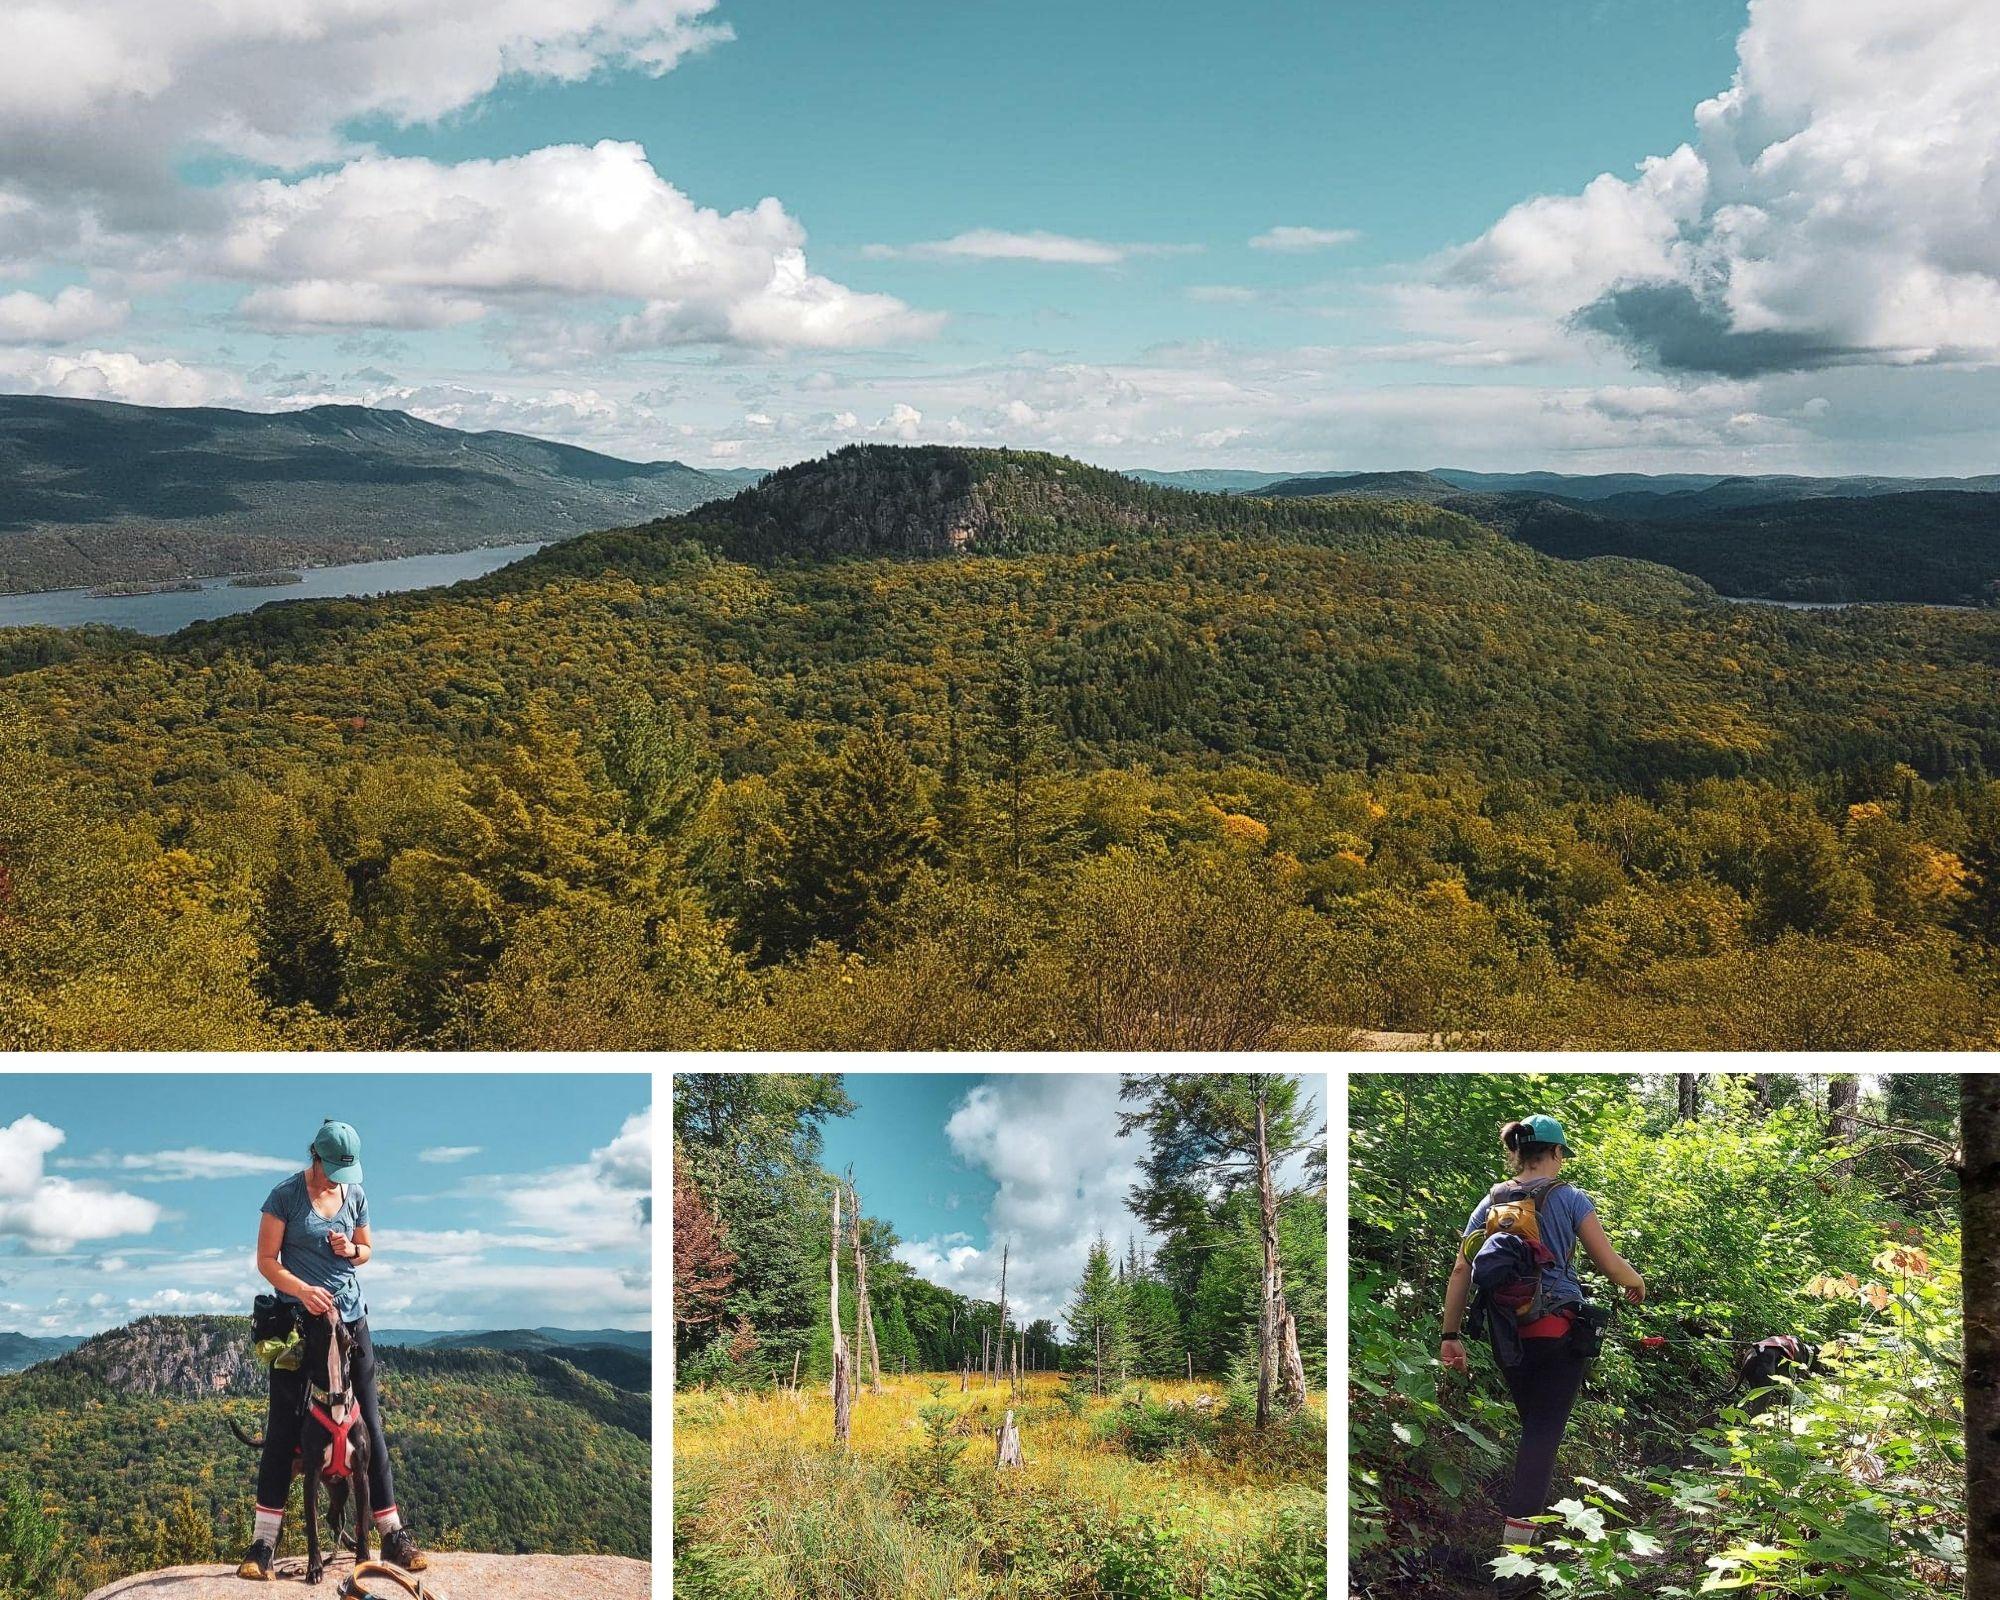 Montage photo de la montagne verte